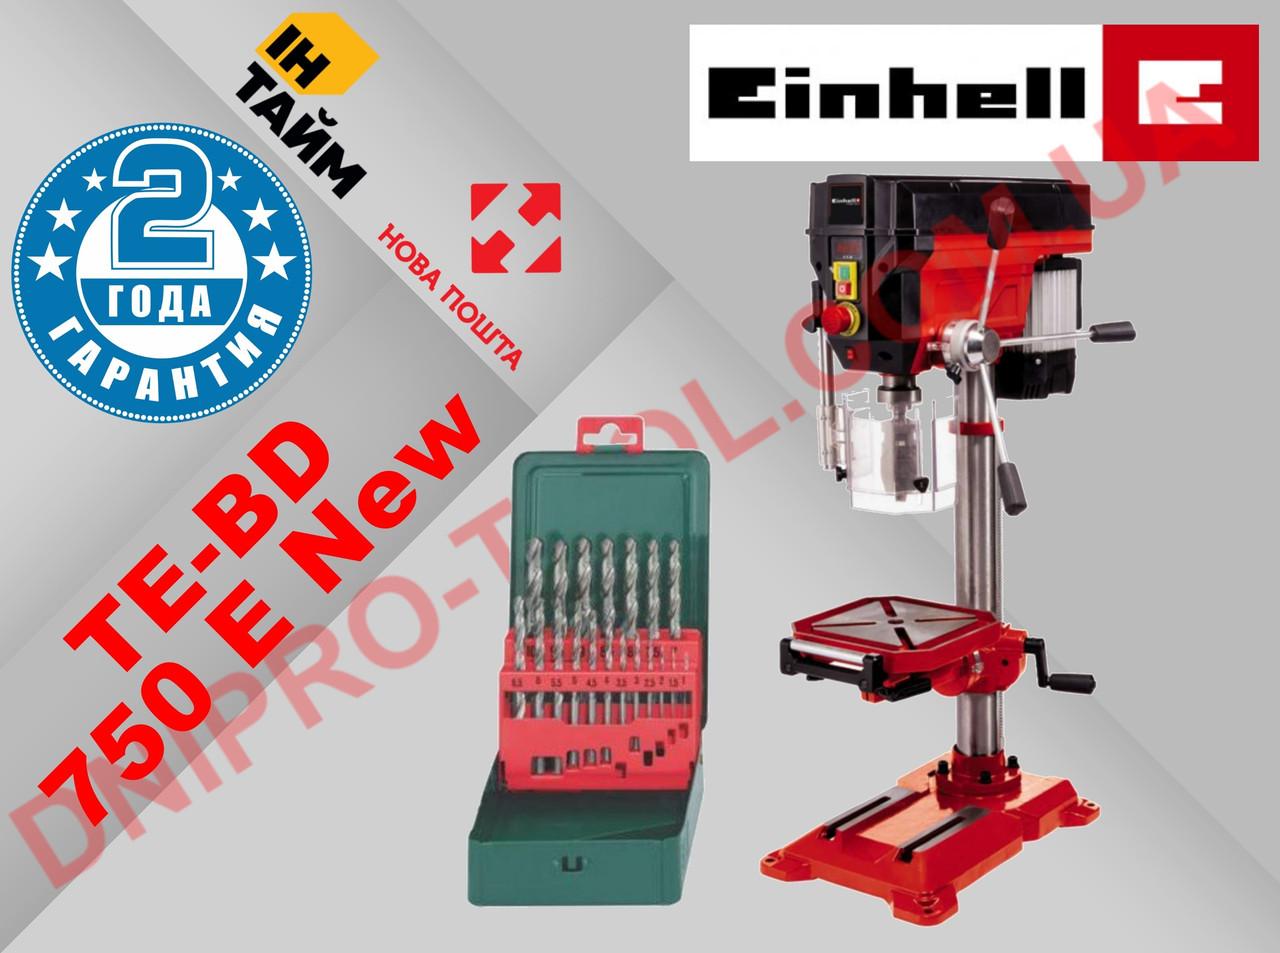 Настольный сверлильный станок Einhell TE-BD 750 Е (BT BD 501 701 801 350)